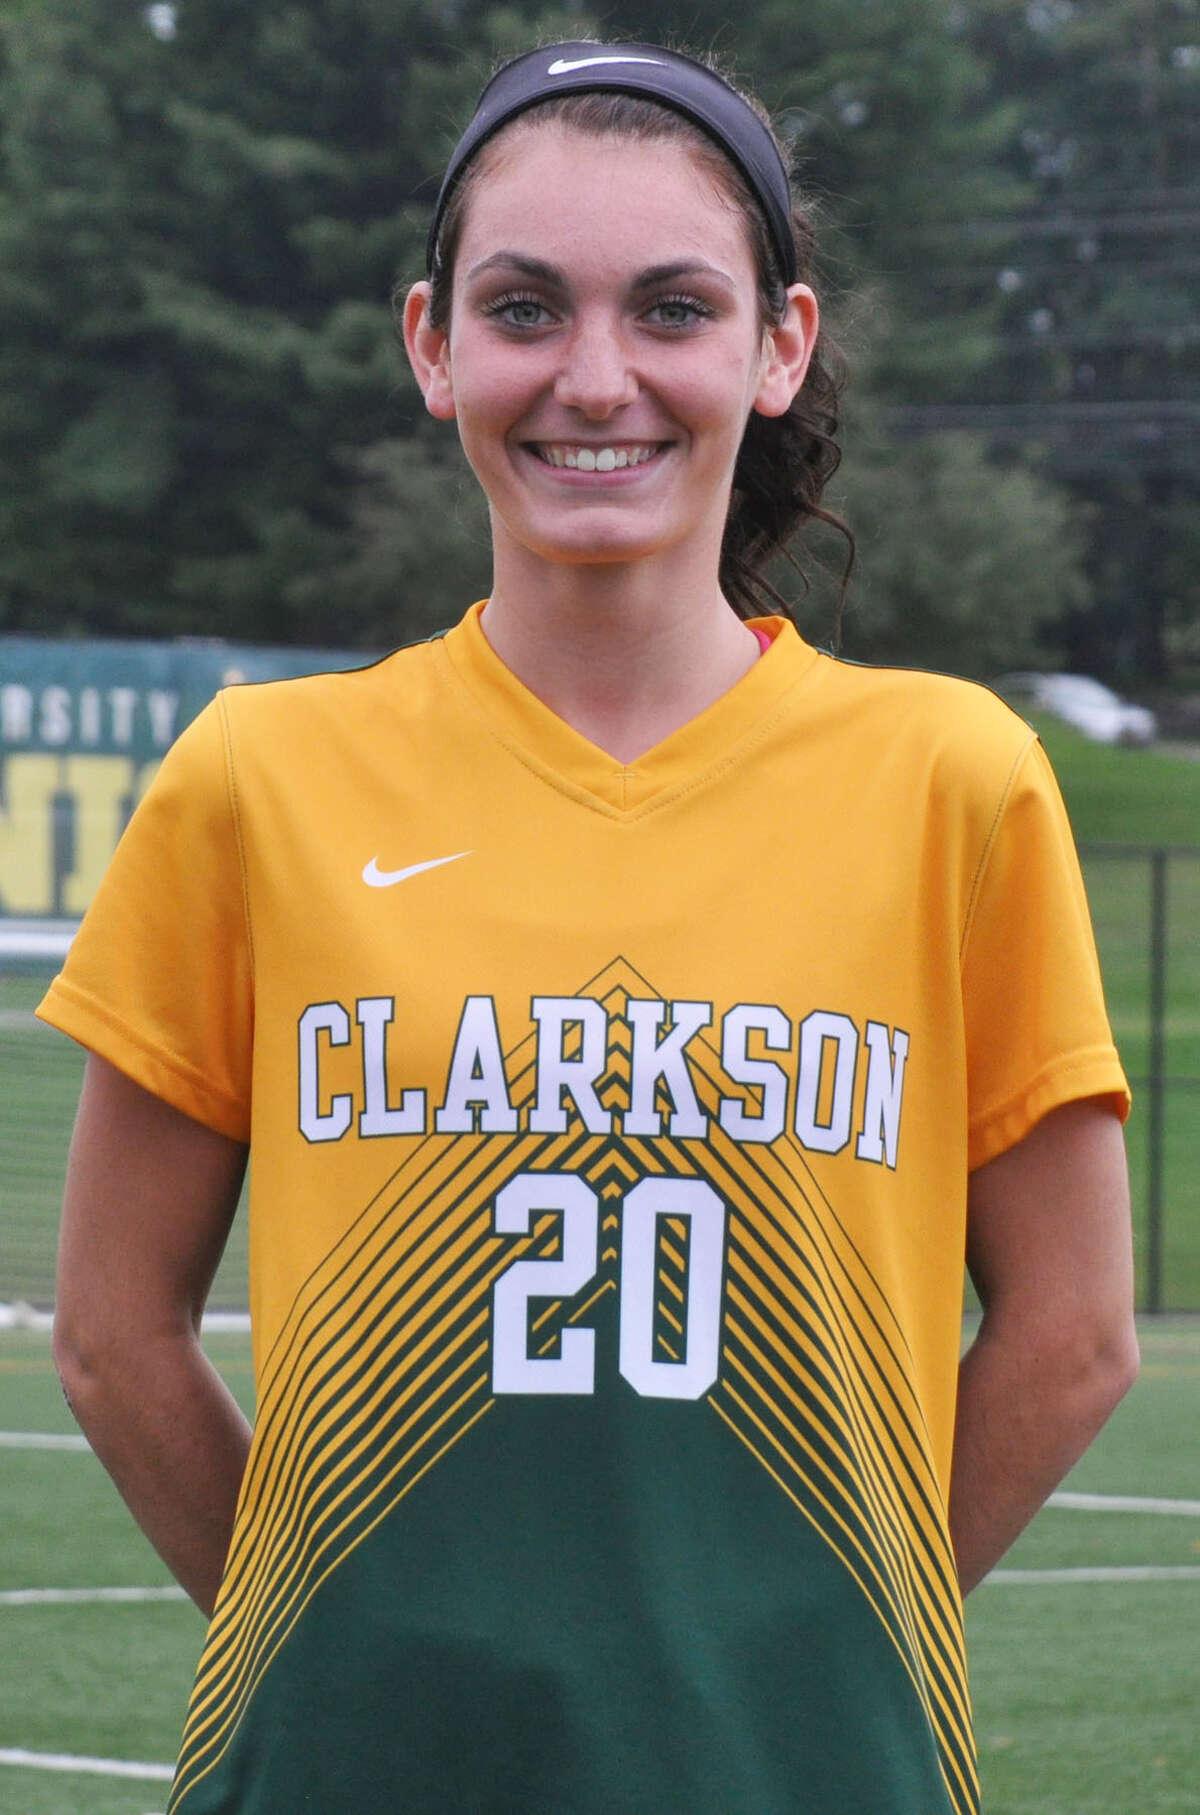 Shaker High graduate Camryn Careccia, right, of the Clarkson women's soccer team. (Courtesy of Clarkson)